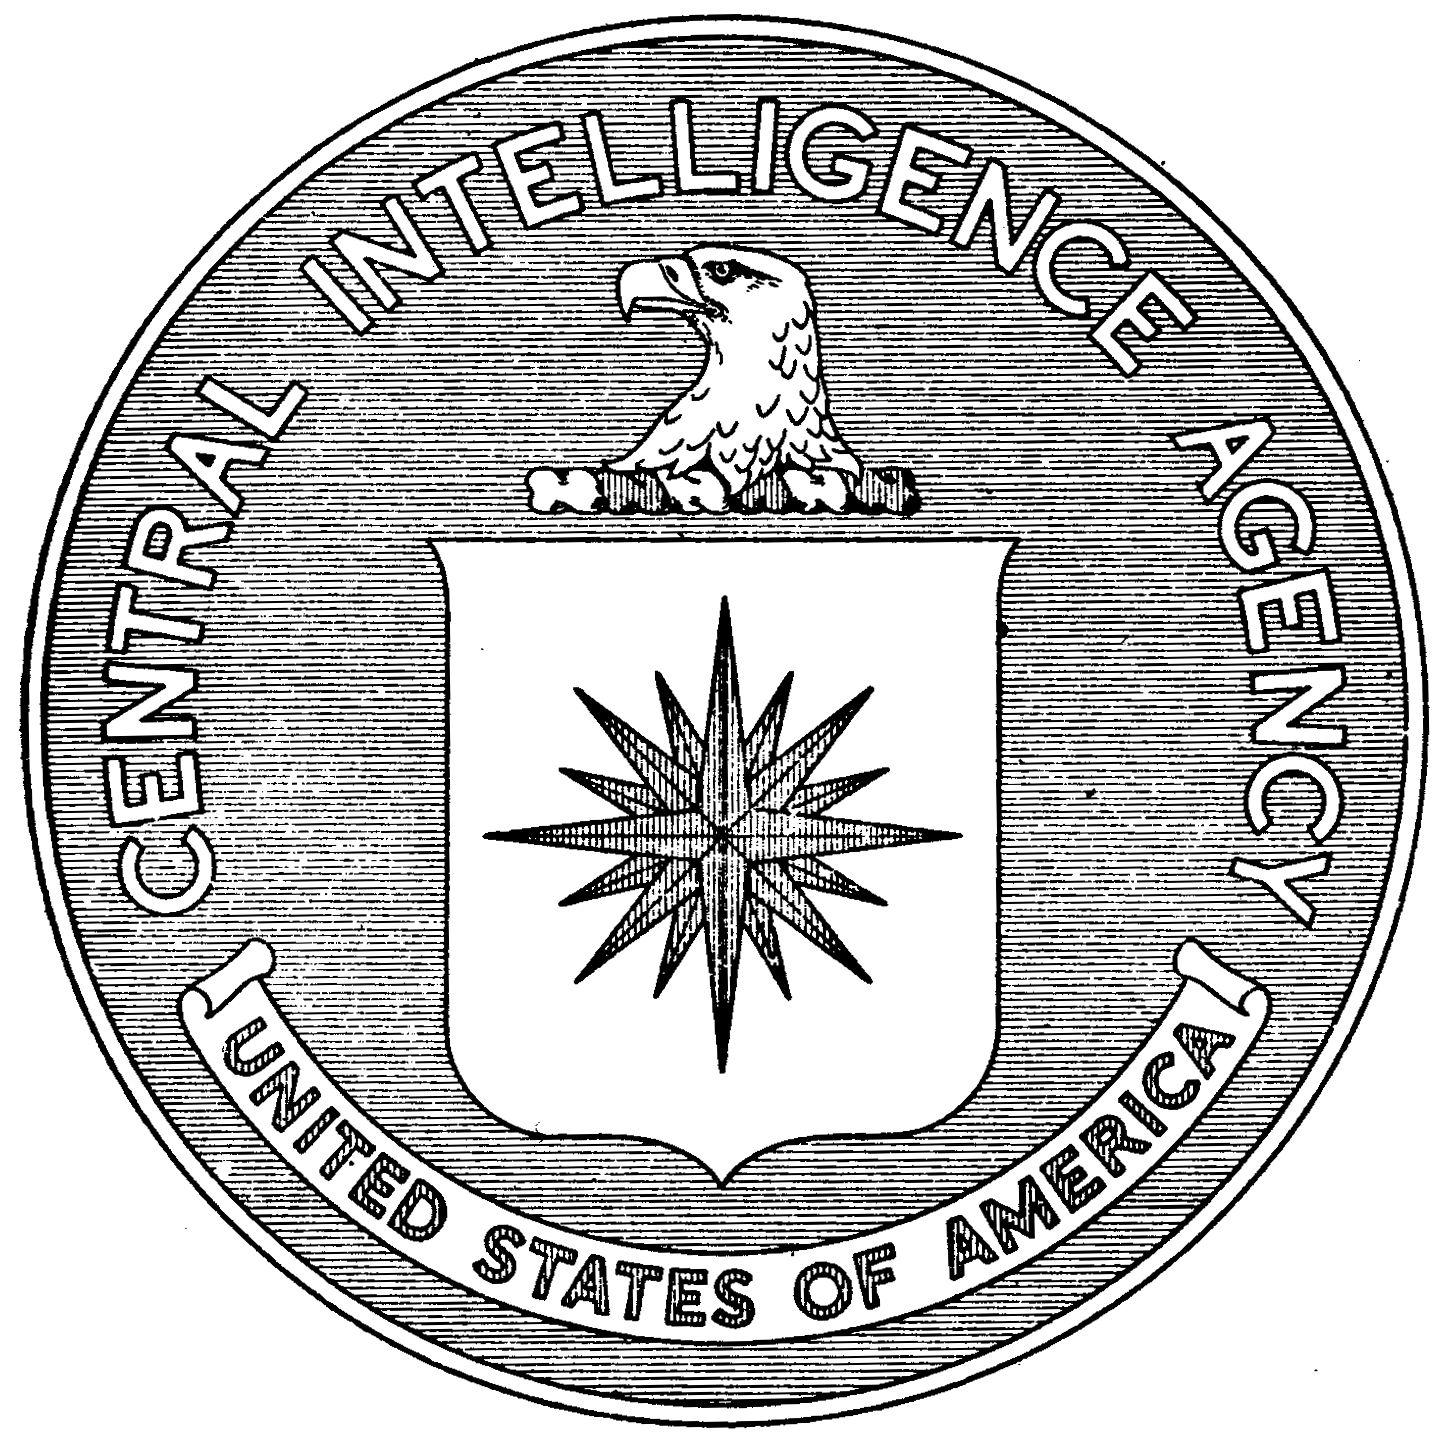 1447x1441 Fileus Centralintelligenceagency Seal Eo10111.jpg